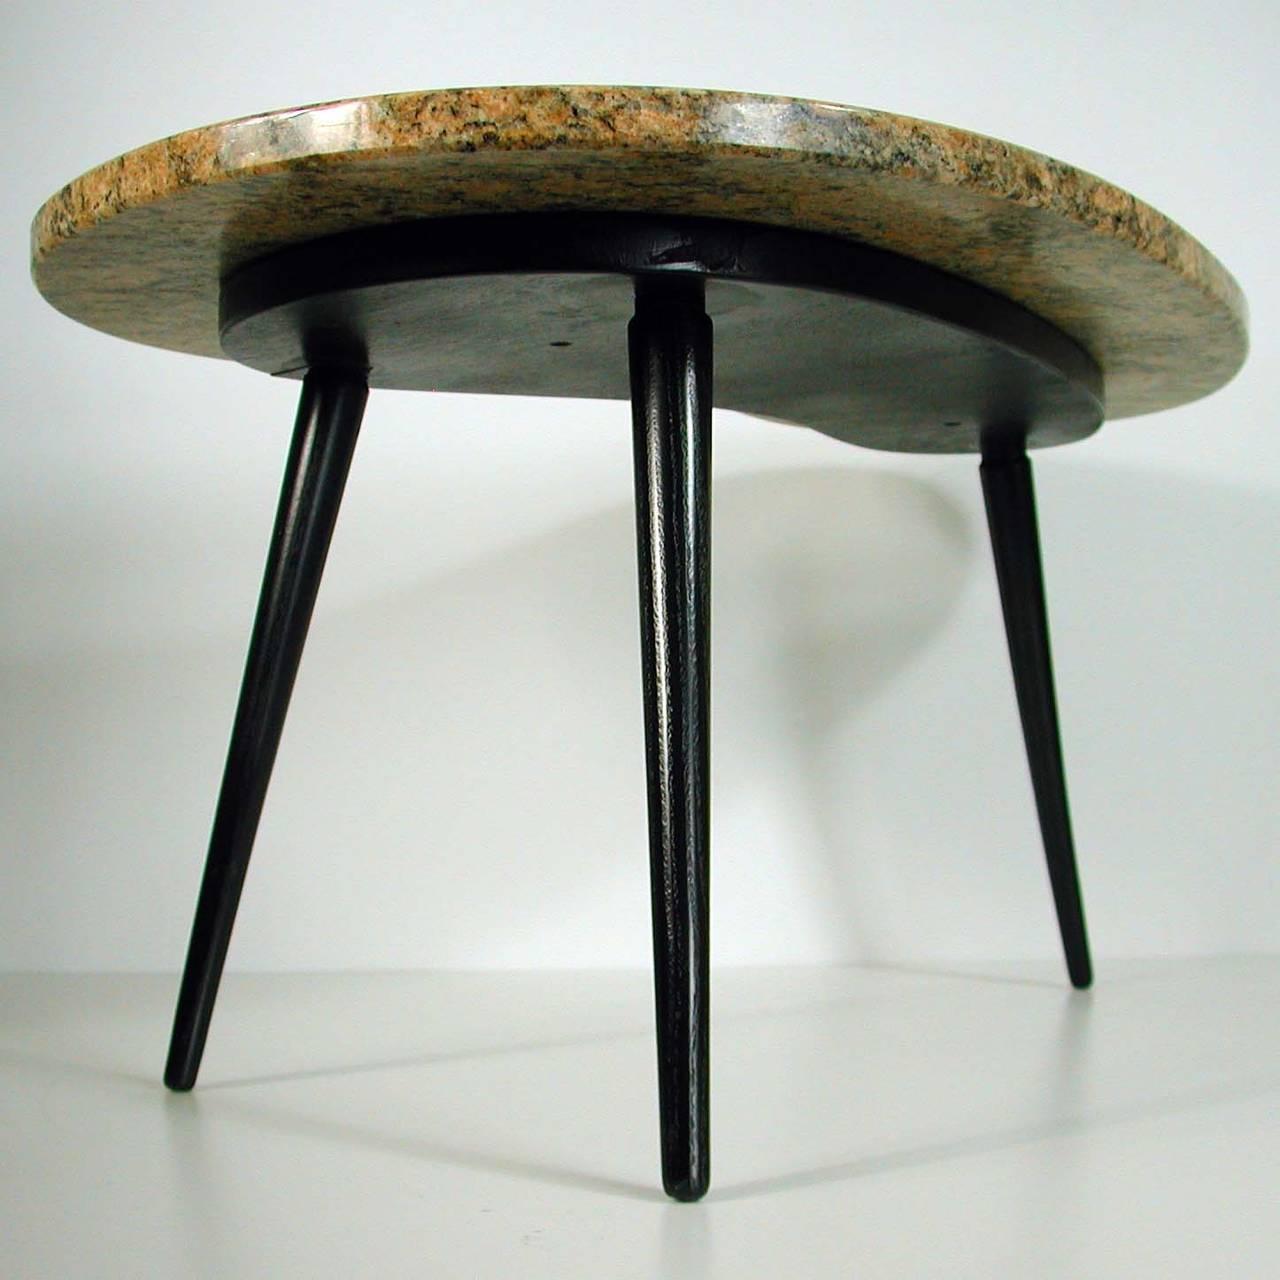 Marble Kidney Coffee Table: 1950s, Italian Kidney-Shaped Giallo Venezia, Marble Side